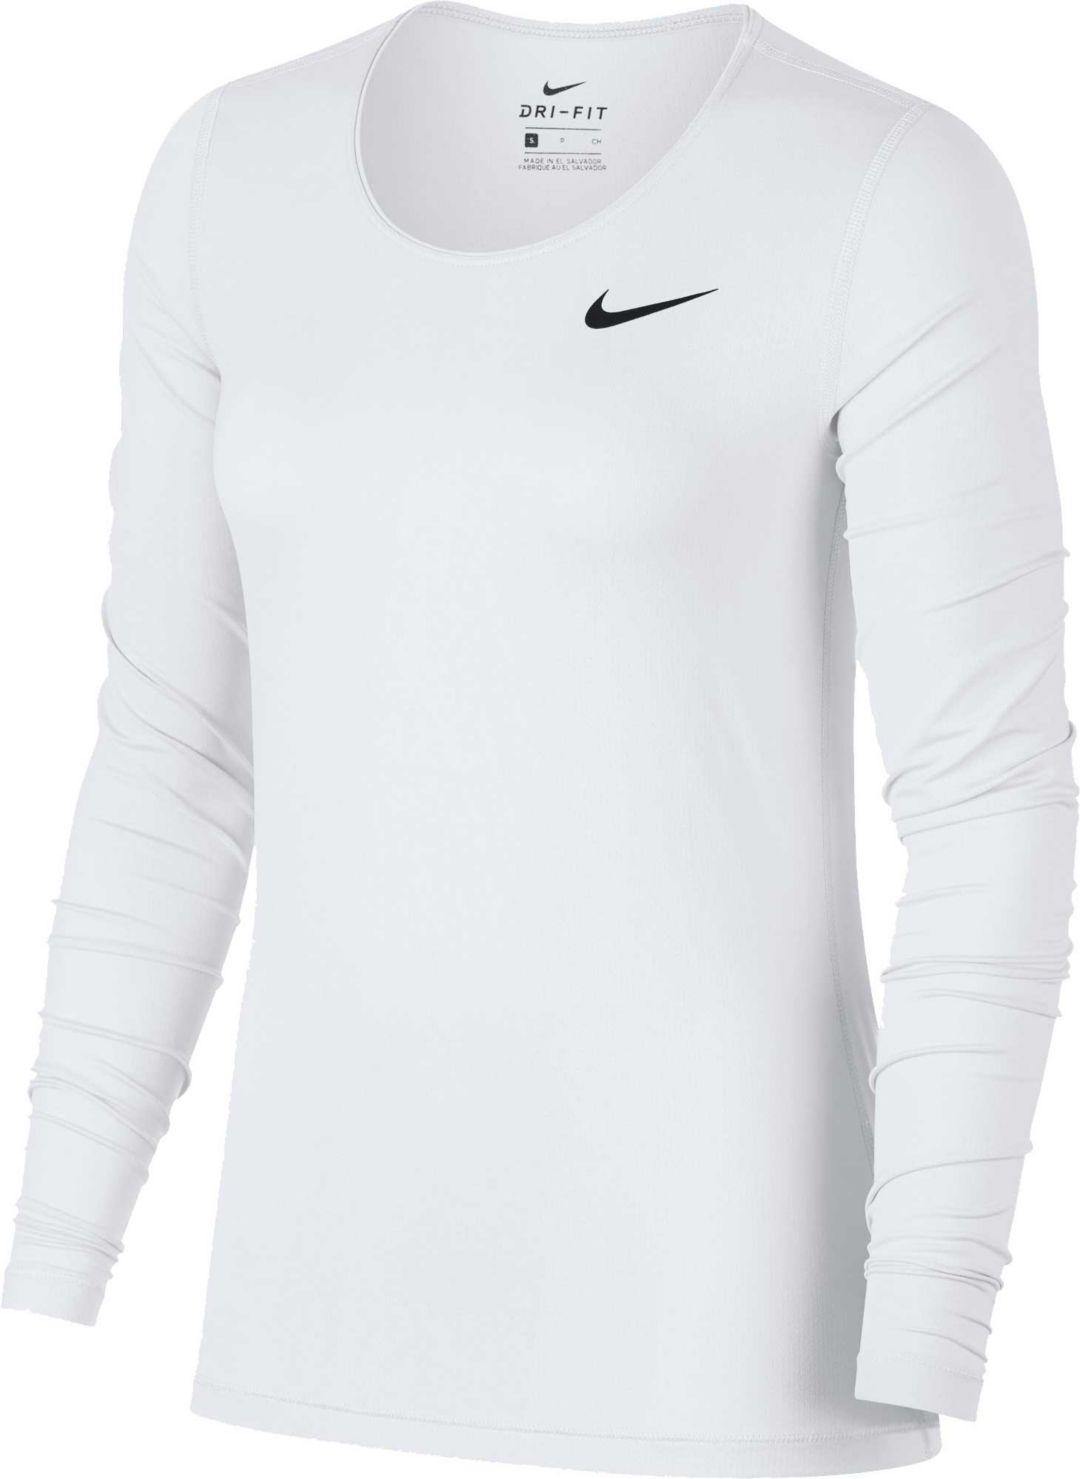 fb924ba6 Nike Women's Pro Cool Long Sleeve Training Shirt. noImageFound. Previous